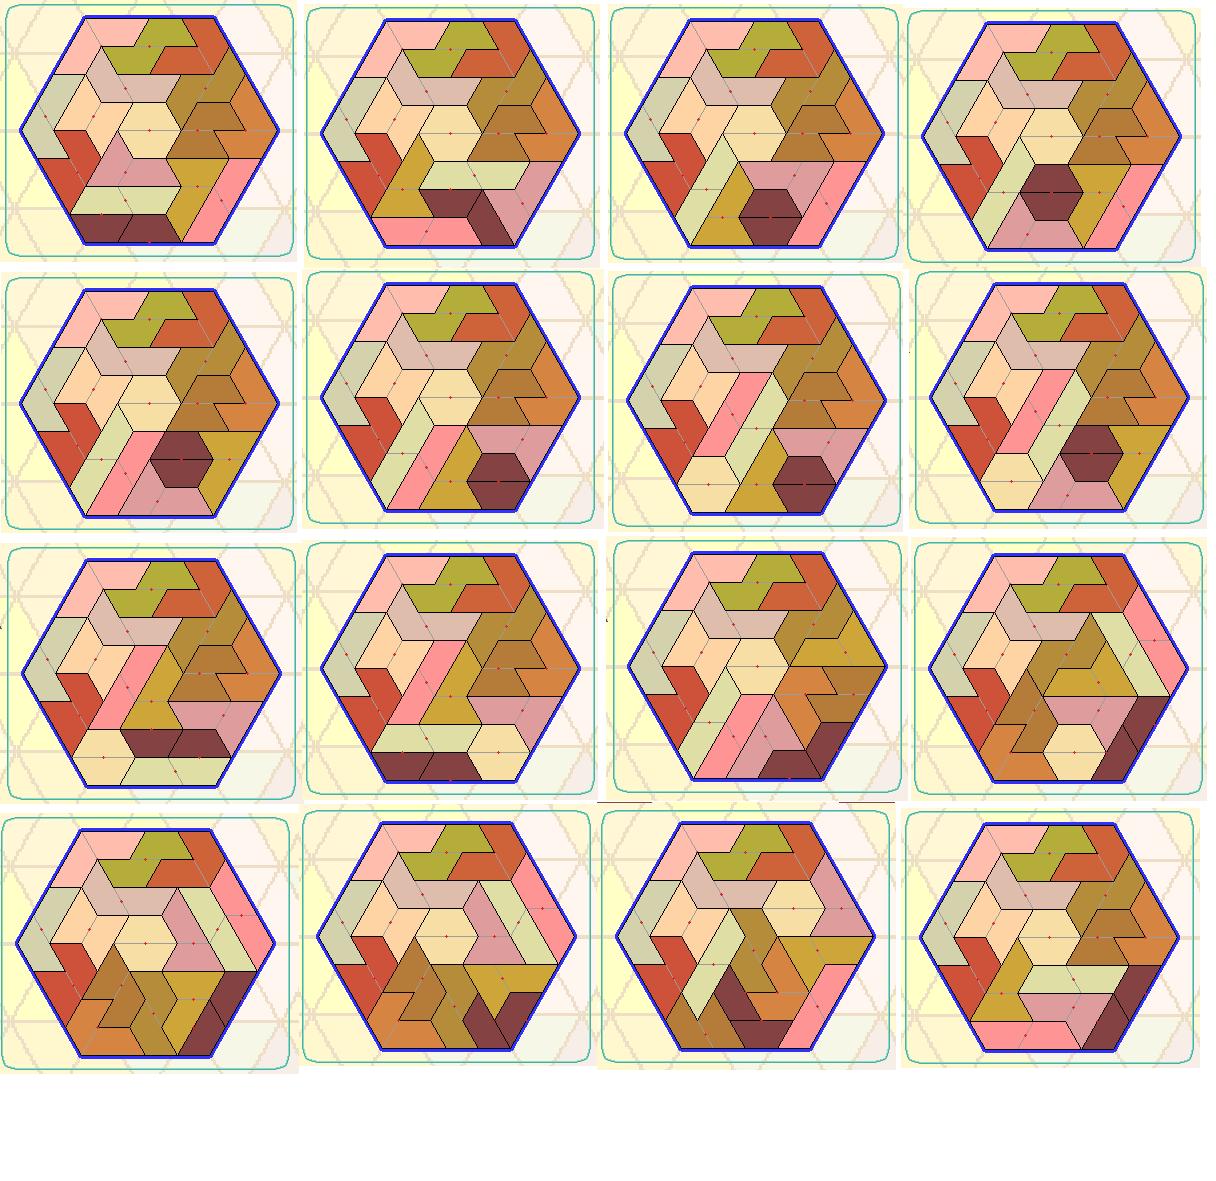 http://www.prise2tete.fr/upload/gwen27-trapezomino33-3.png